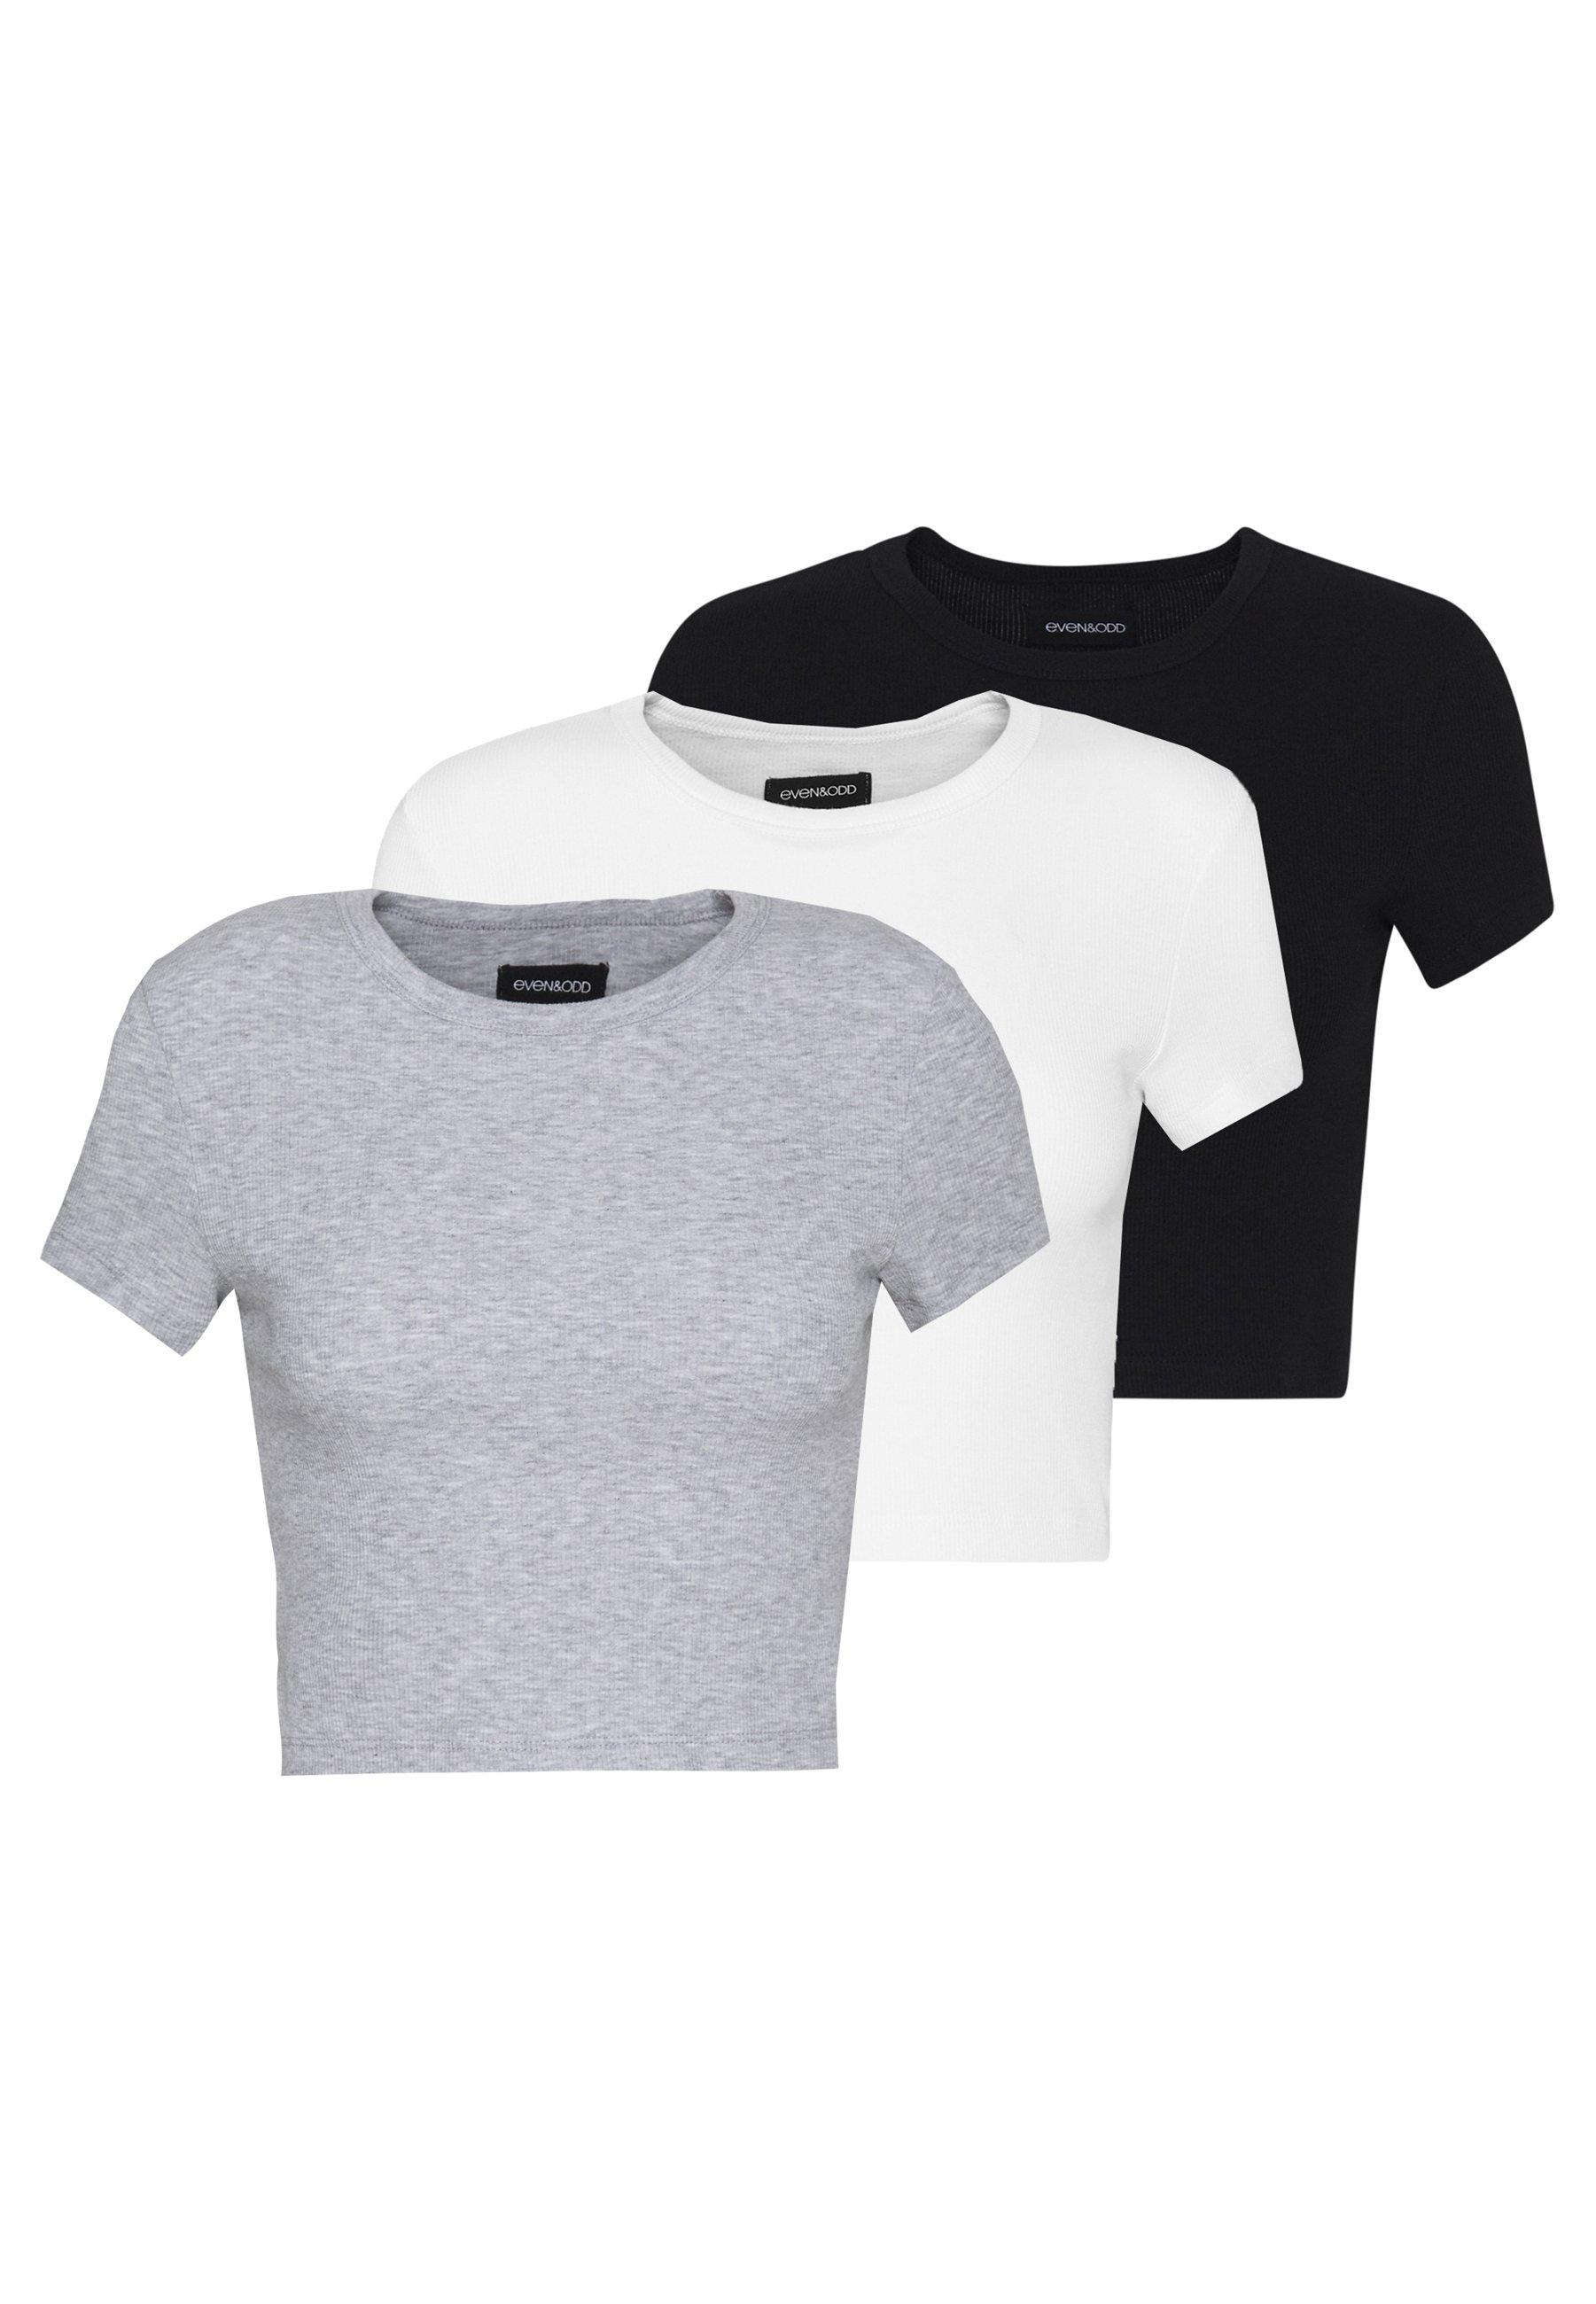 "/""SIGNAL/""  Damen  T-Shirt  3//4 Arm   Gr 2XL  Toffee   Neu mit Etikett M"